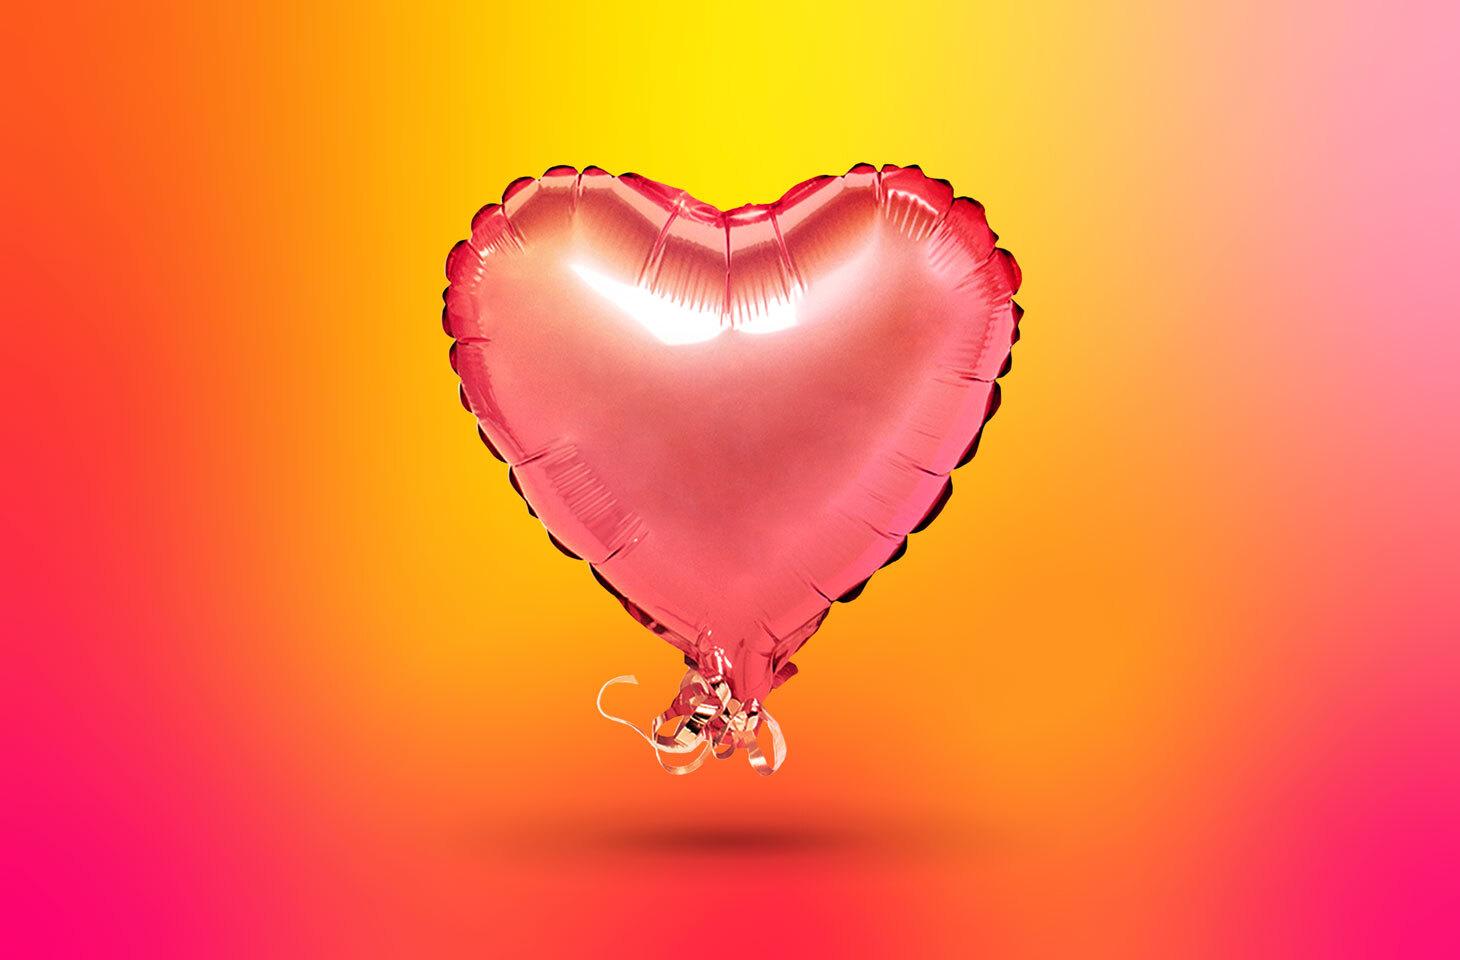 Tips for private and safe dating on Tinder | Kaspersky official blog